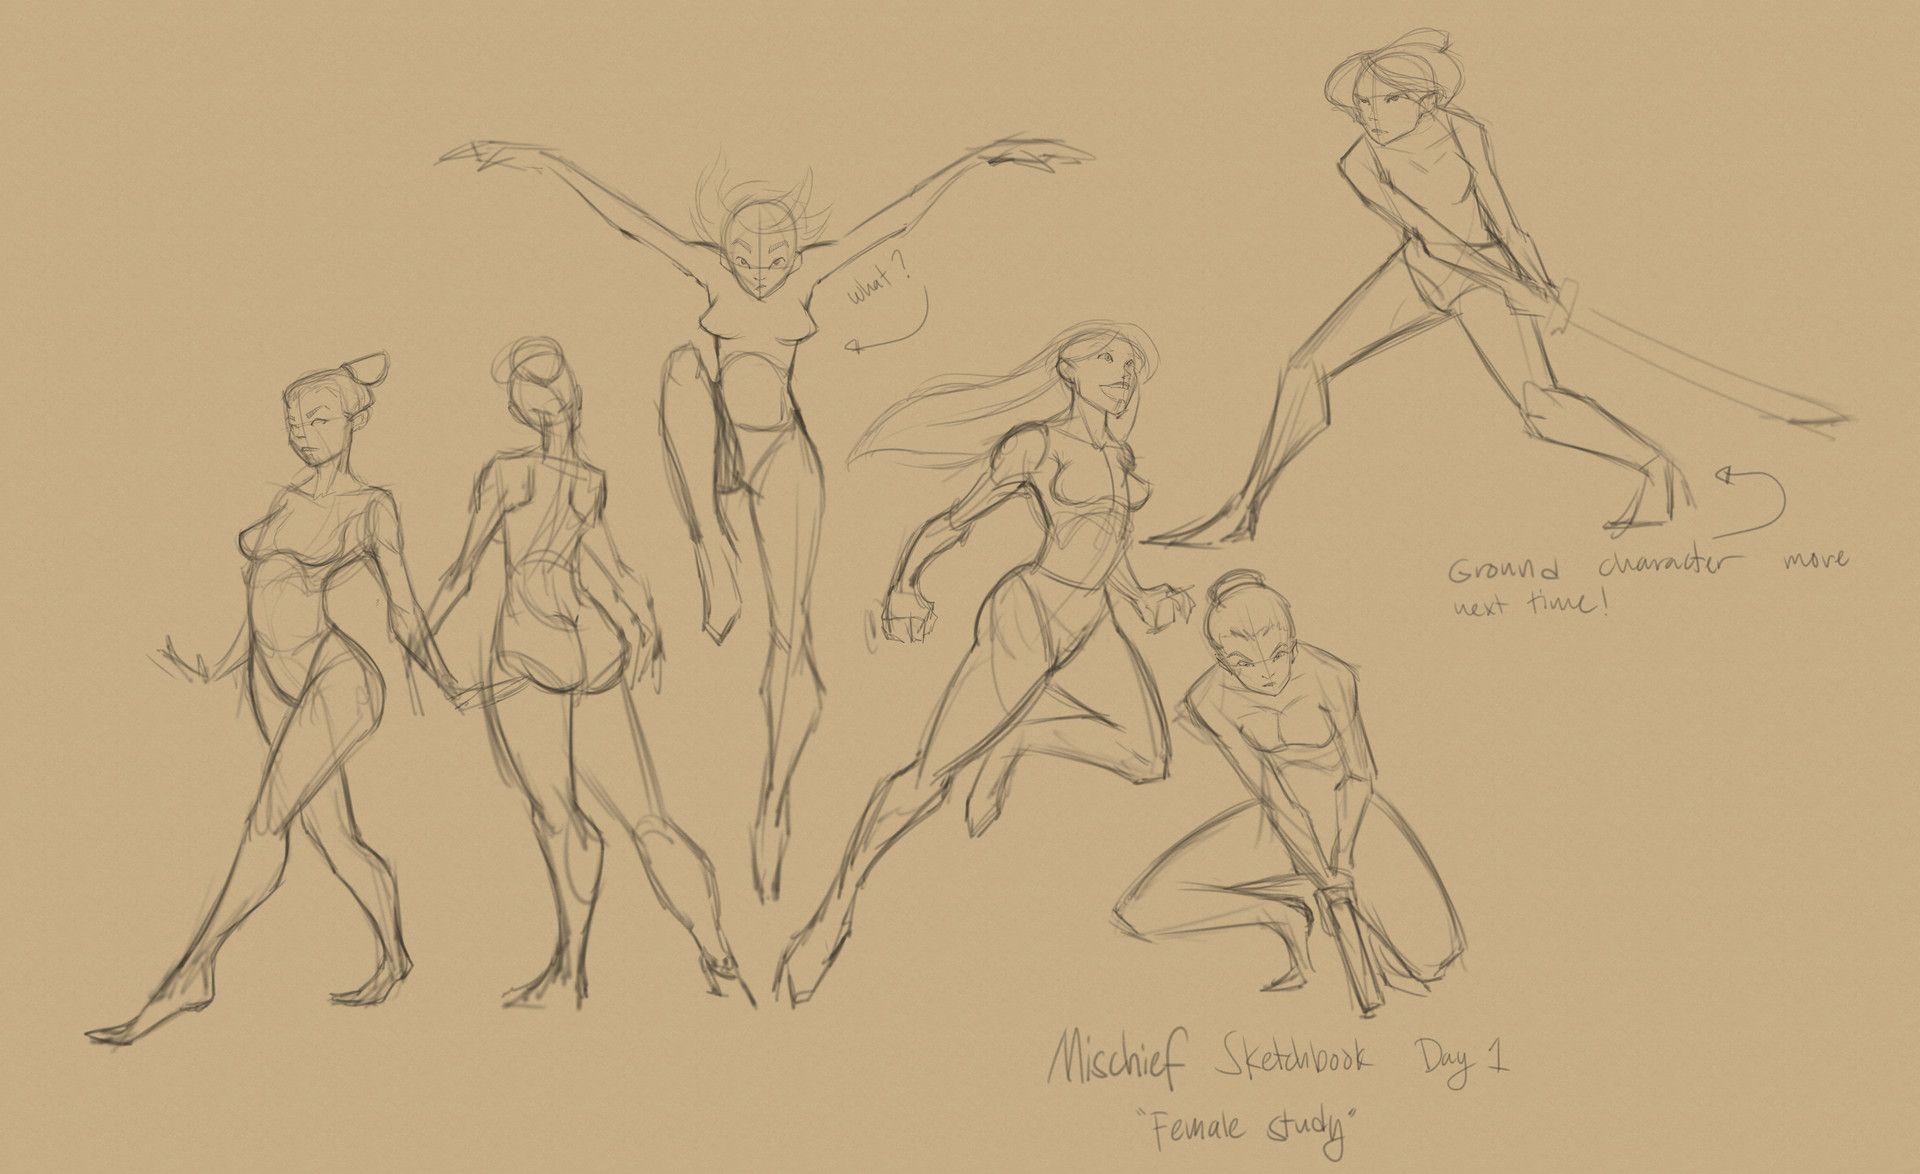 ArtStation - Mischief Sketching Days 1-5, Joshua Black